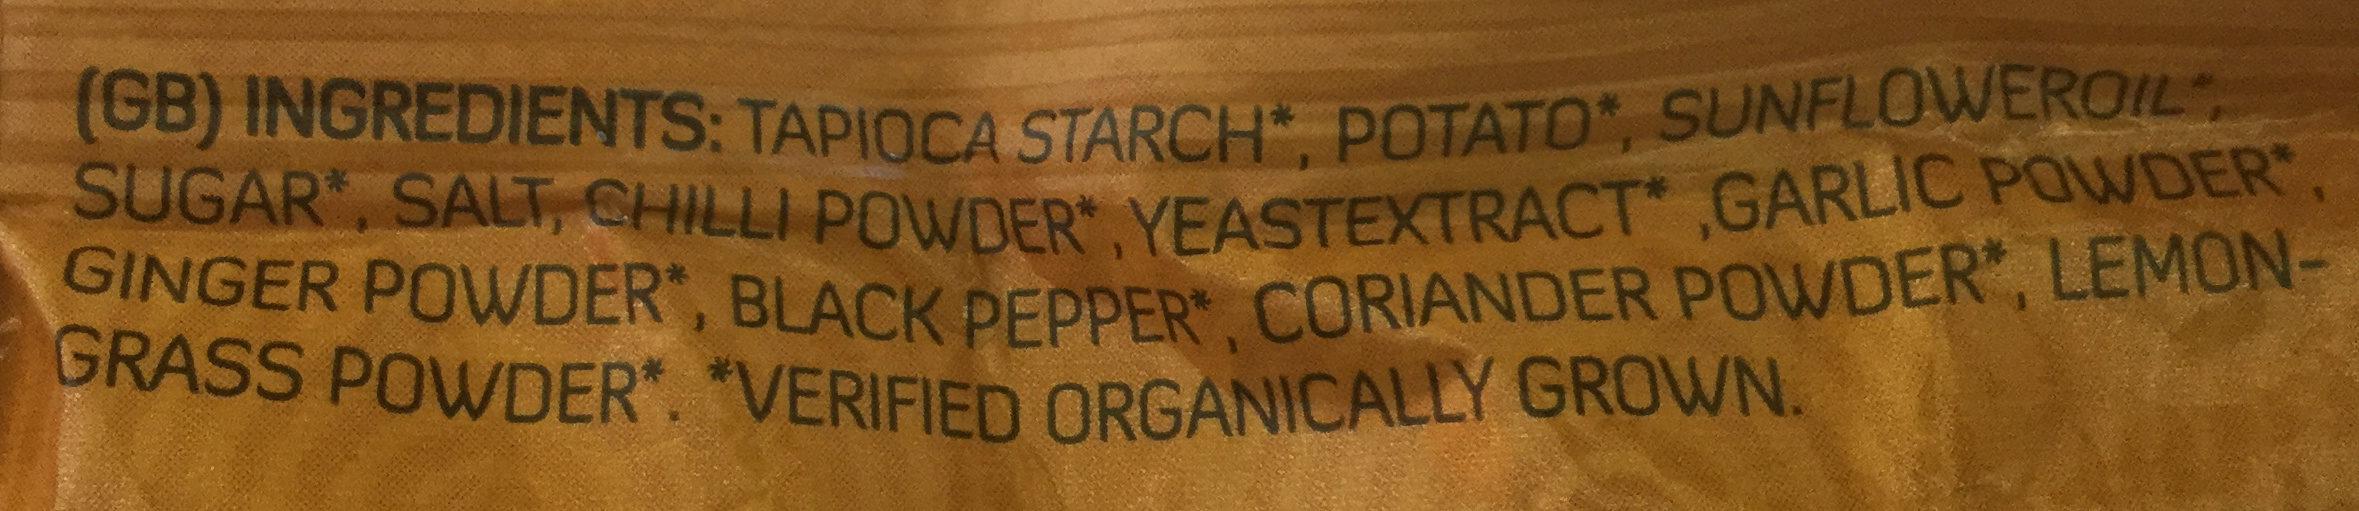 Chips Orientale - Ingredients - en